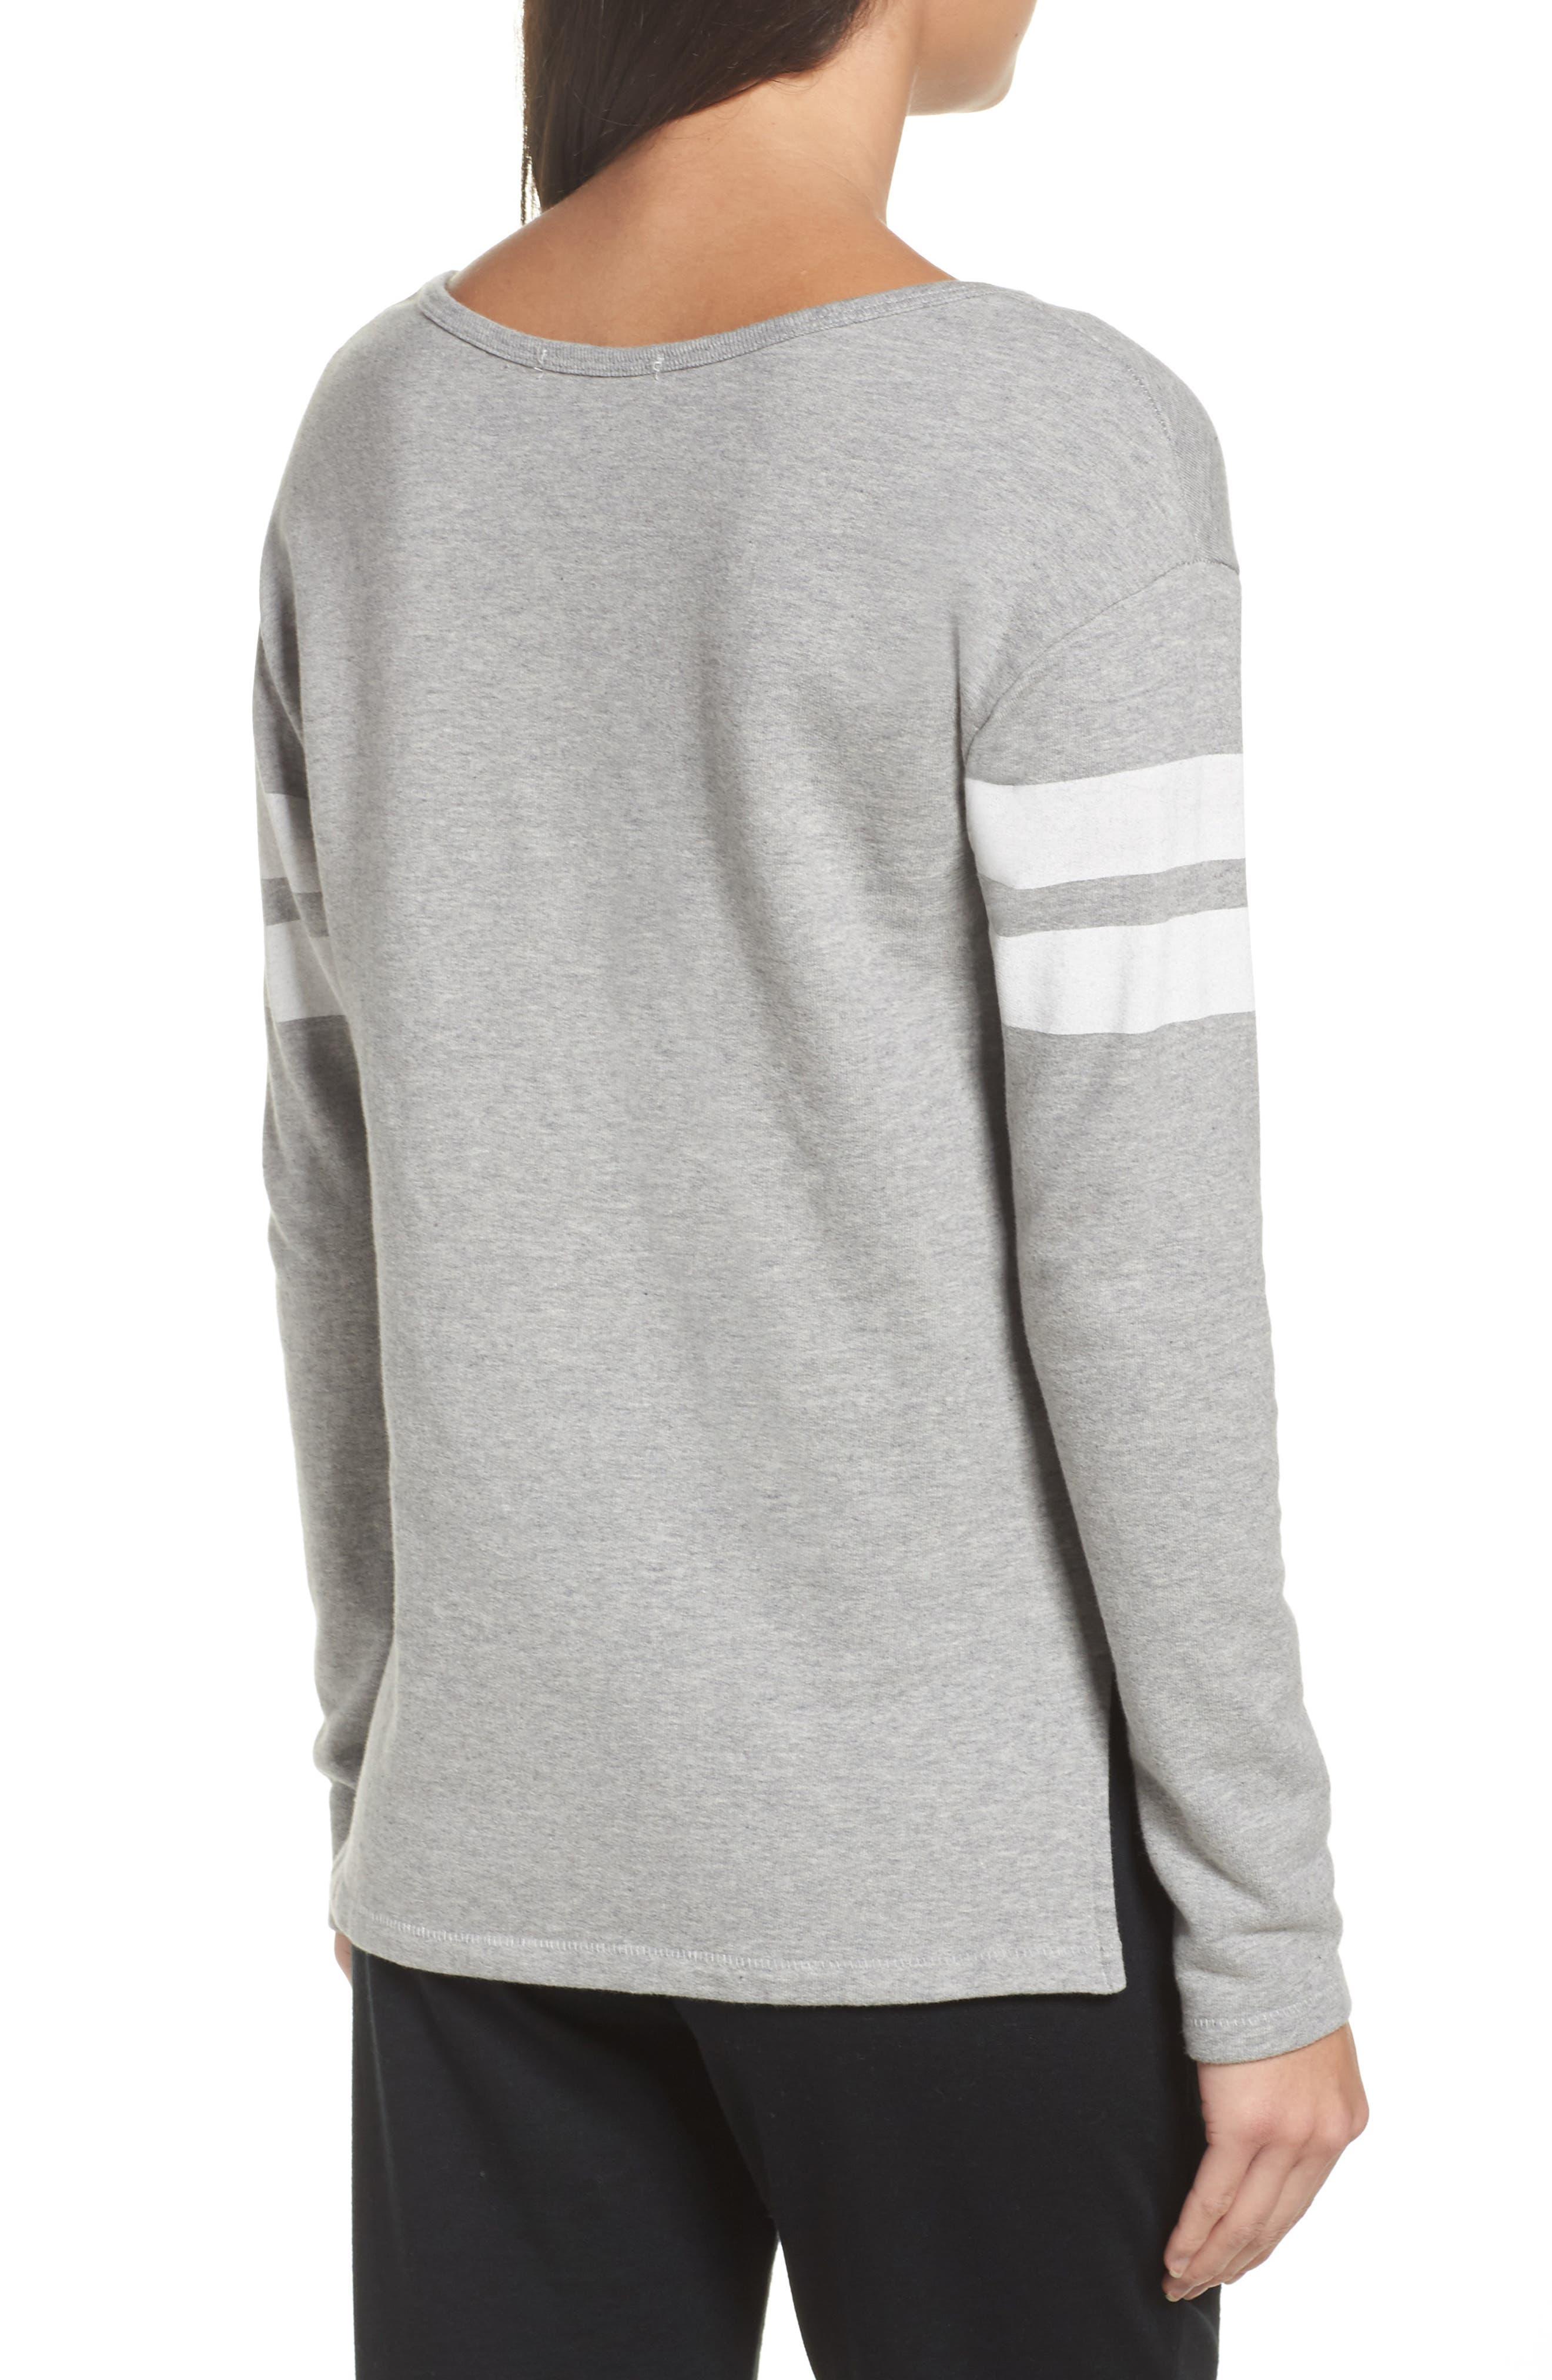 NFL New England Patriots Champion Sweatshirt,                             Alternate thumbnail 2, color,                             Heather Grey